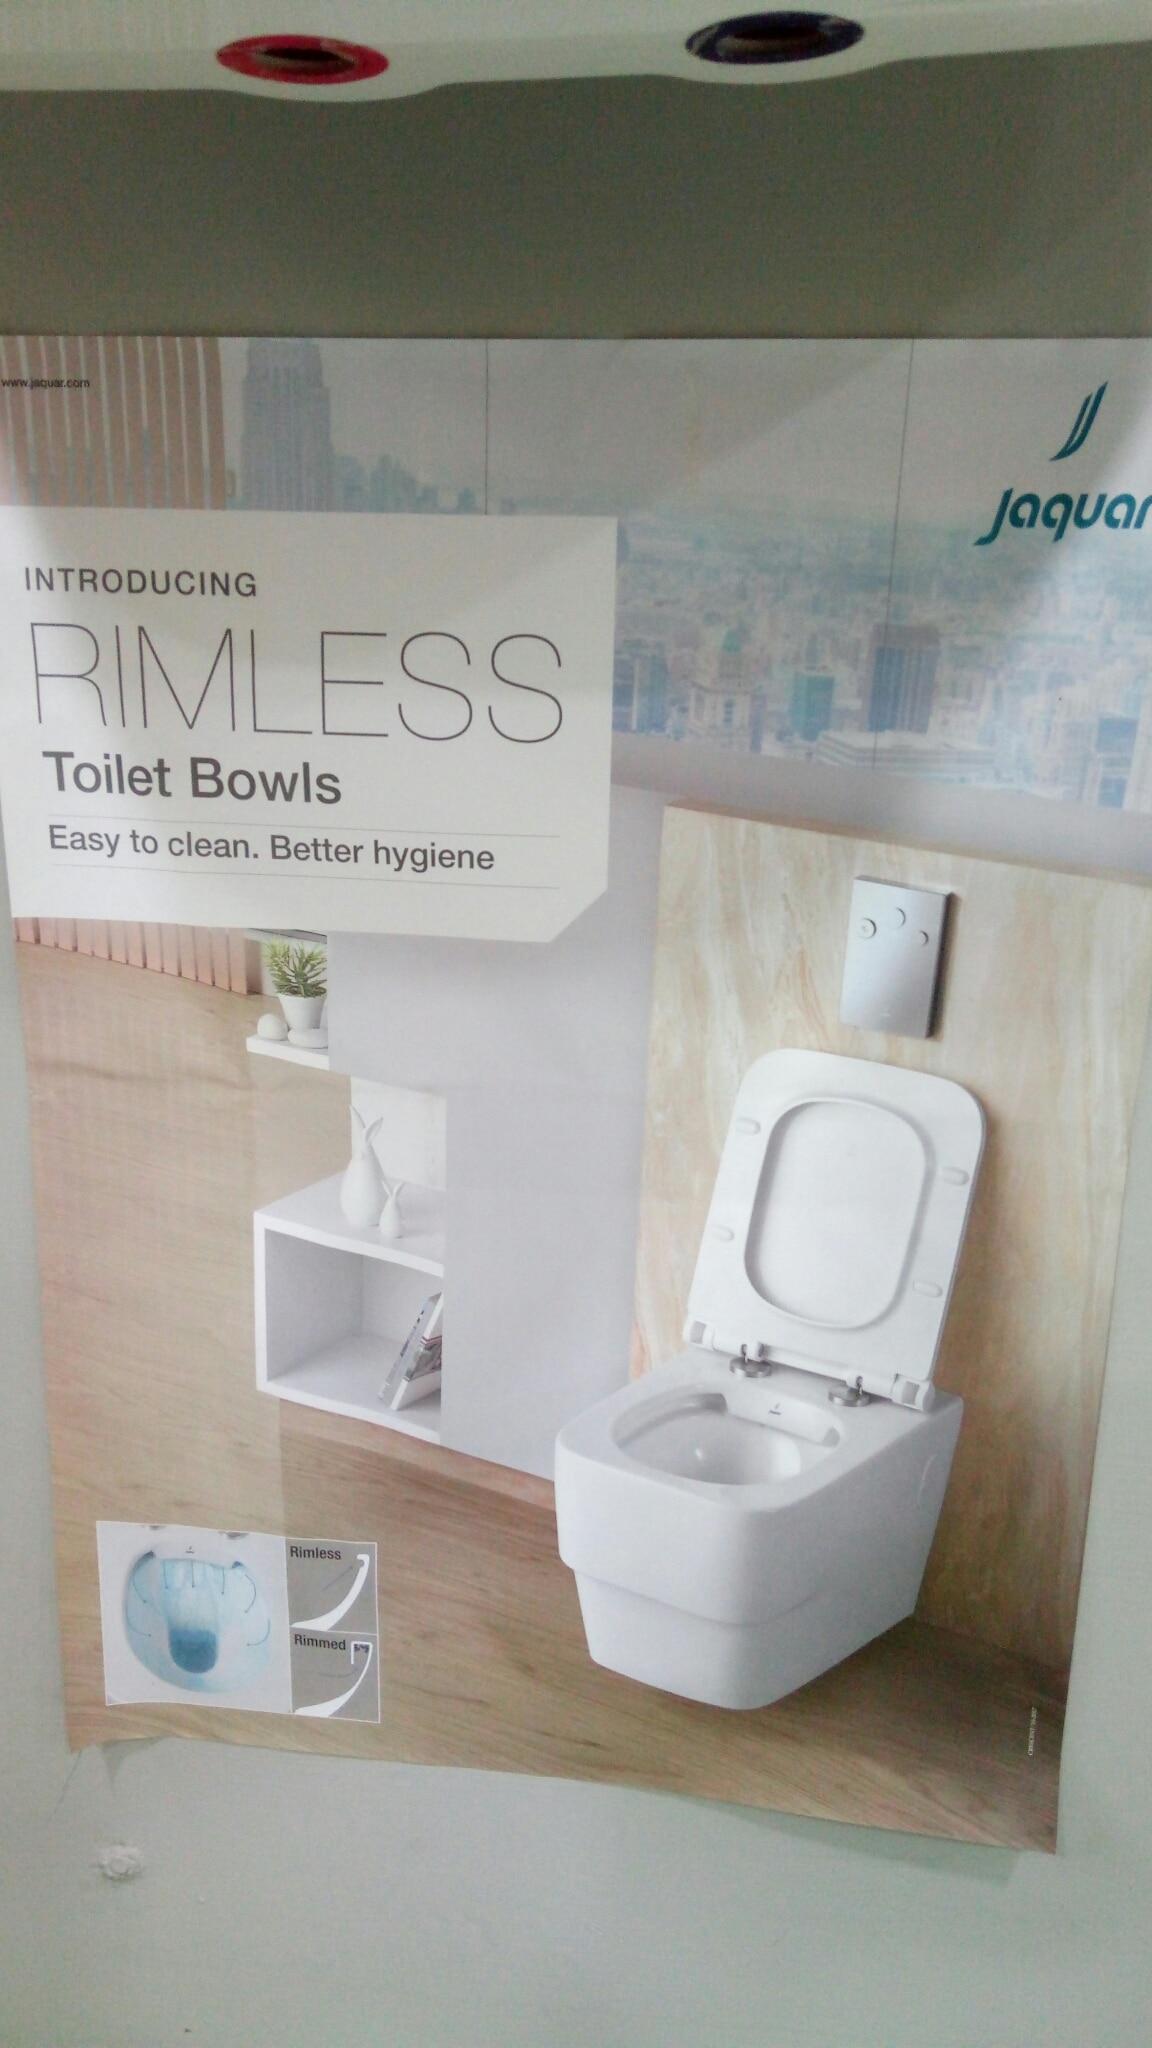 RimLess Toilet Bowls : INTERIOR & BUILDING MATERIALS 9962686686